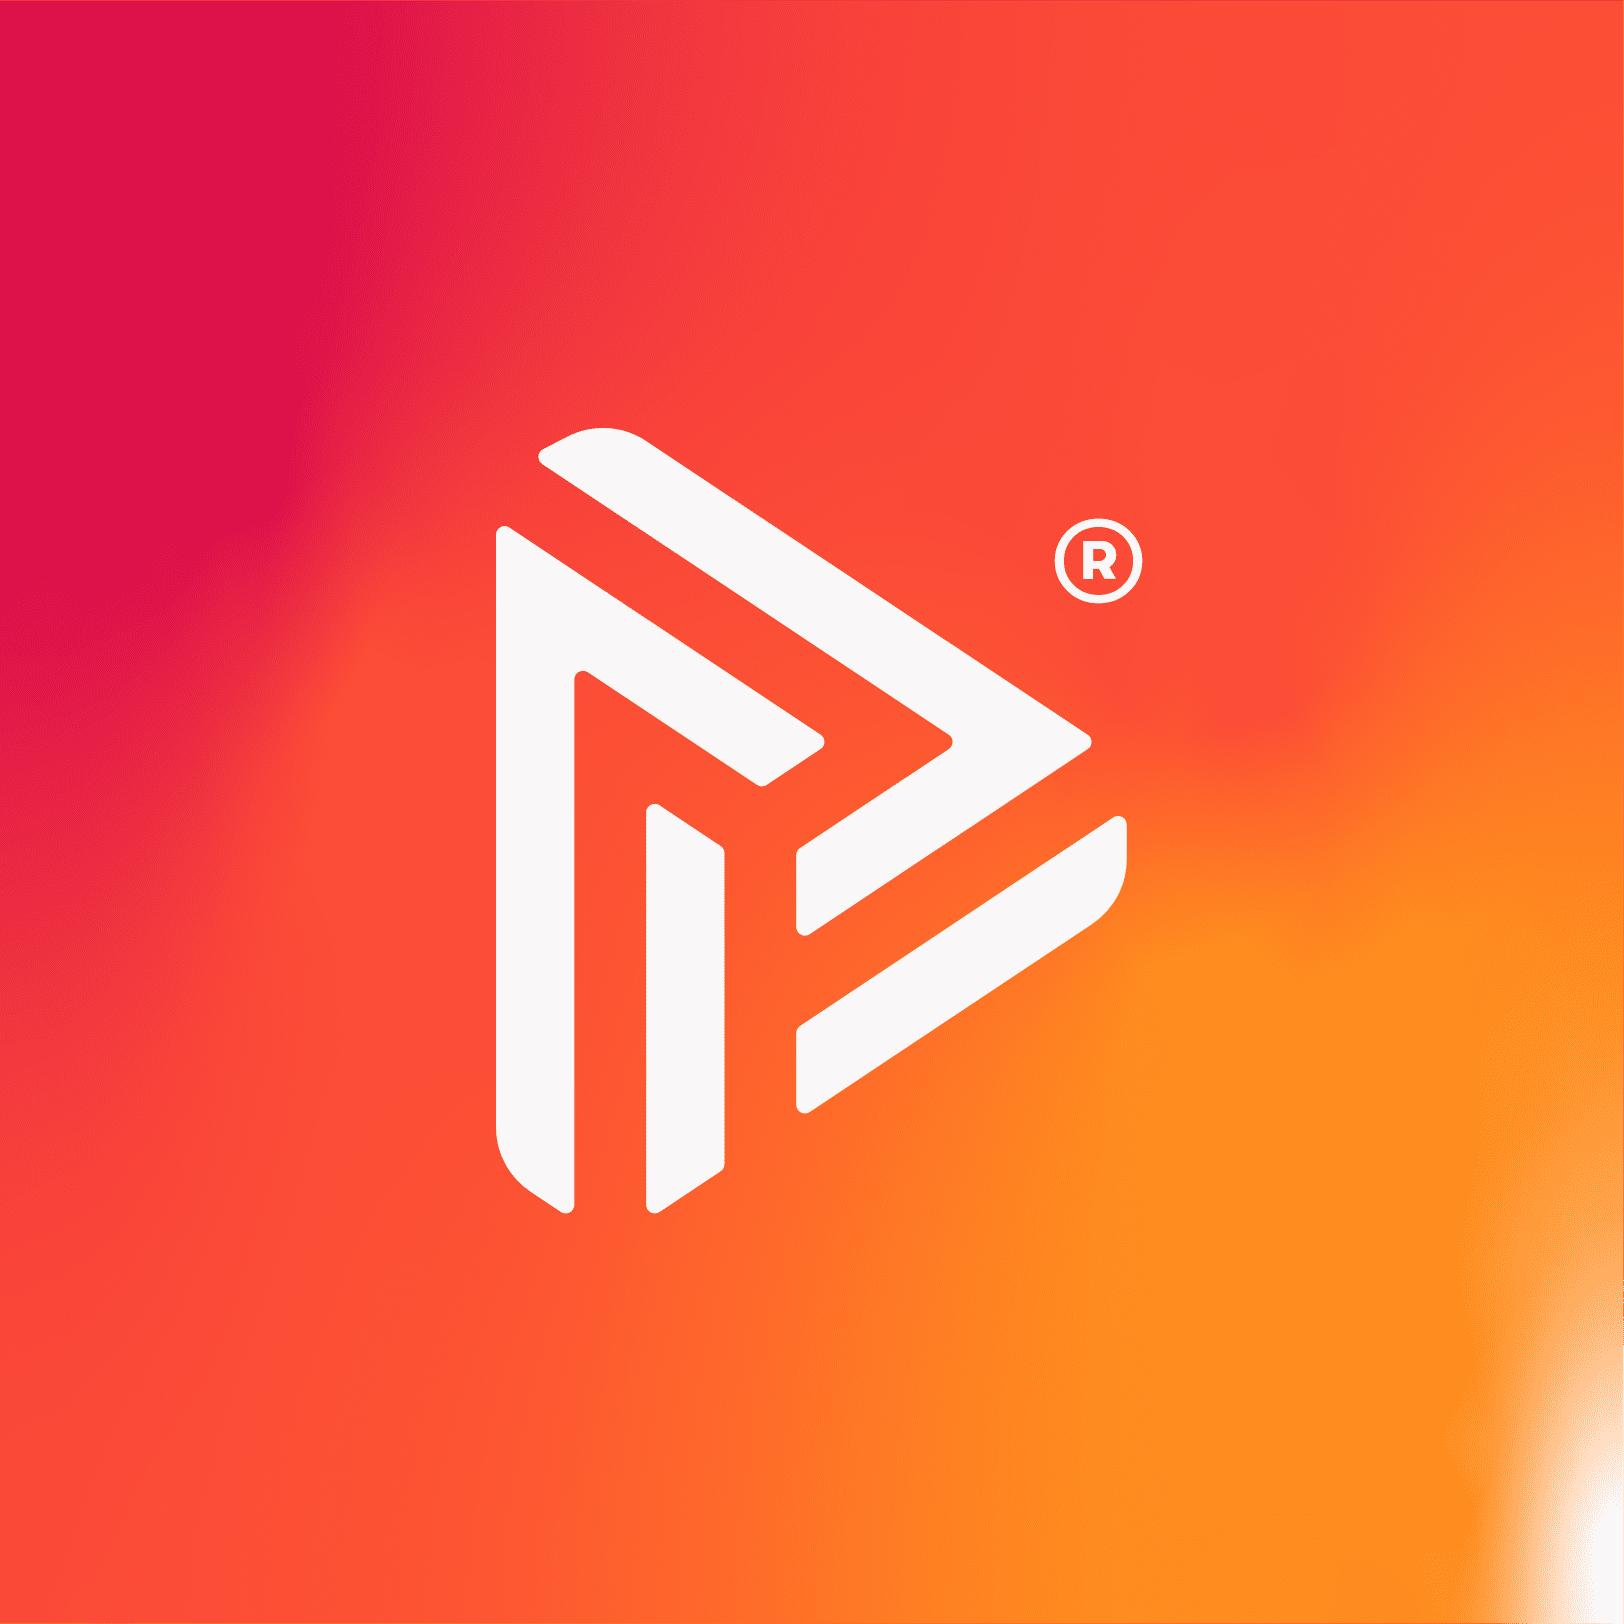 Papercup - Crunchbase Company Profile & Funding